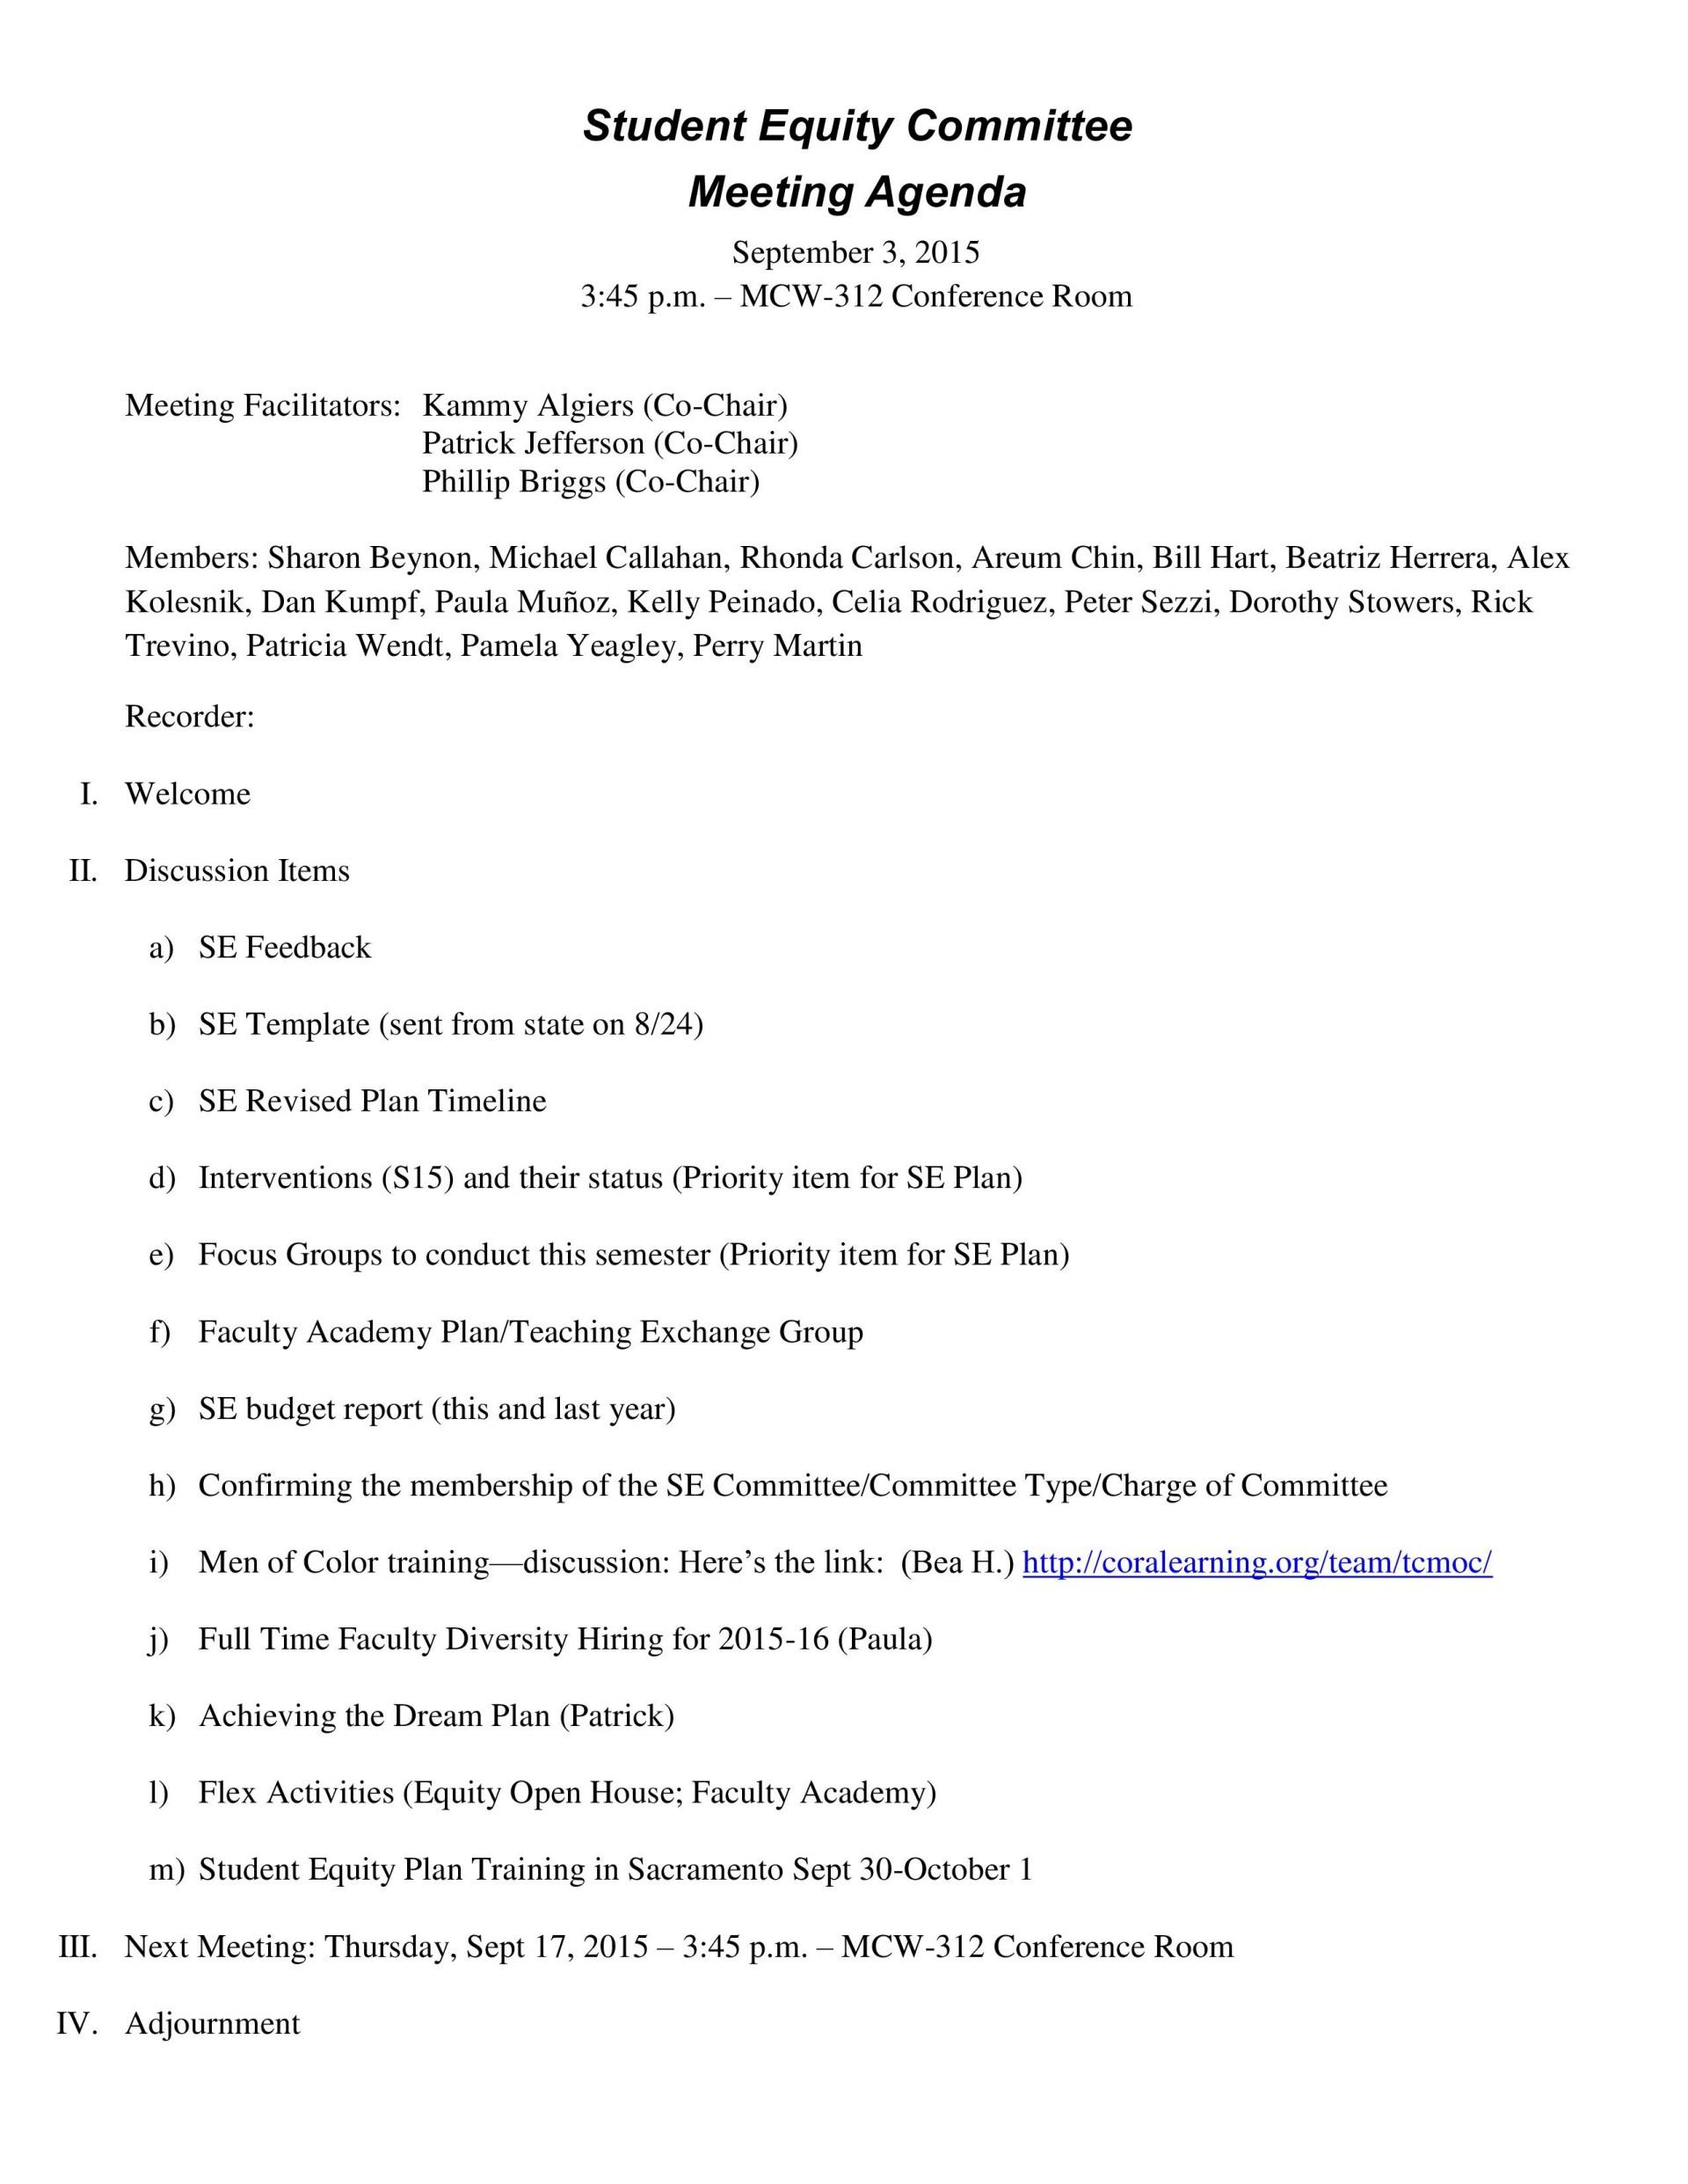 006 Unusual Formal Meeting Agenda Template Example  Board Pdf1920